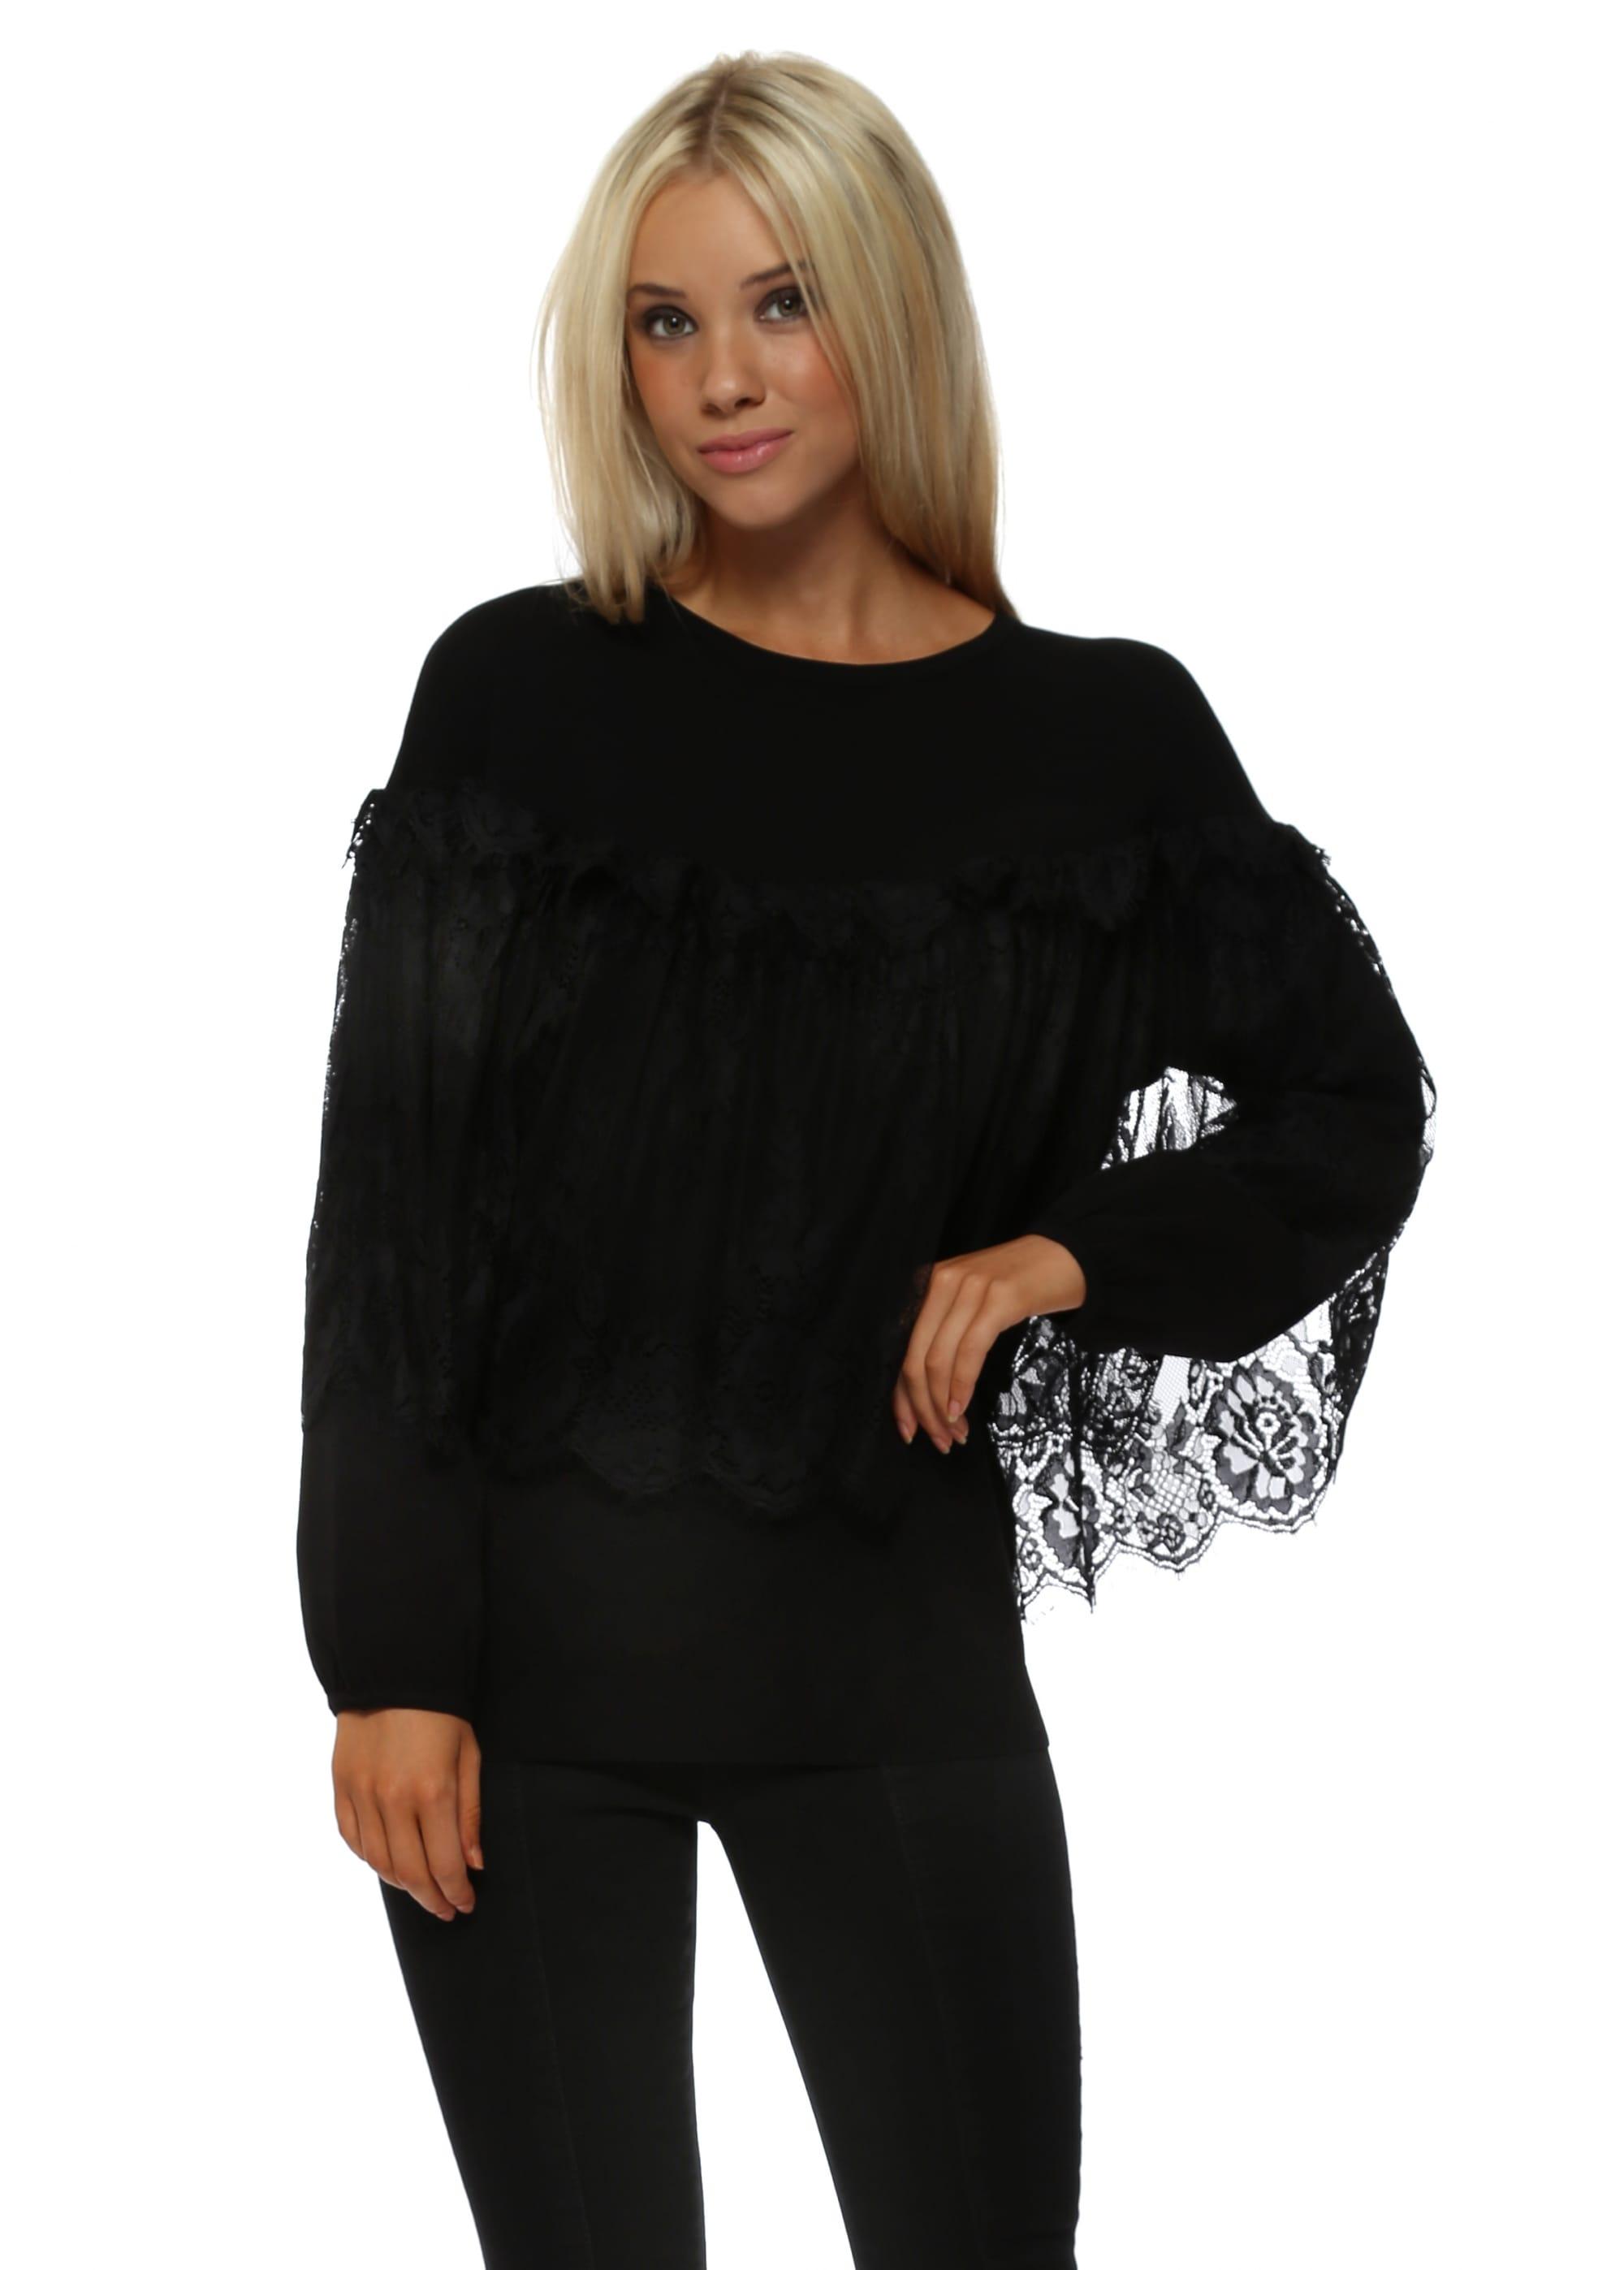 e0f31b3b653 Laetitia Mem Black Lace Cape Jumper